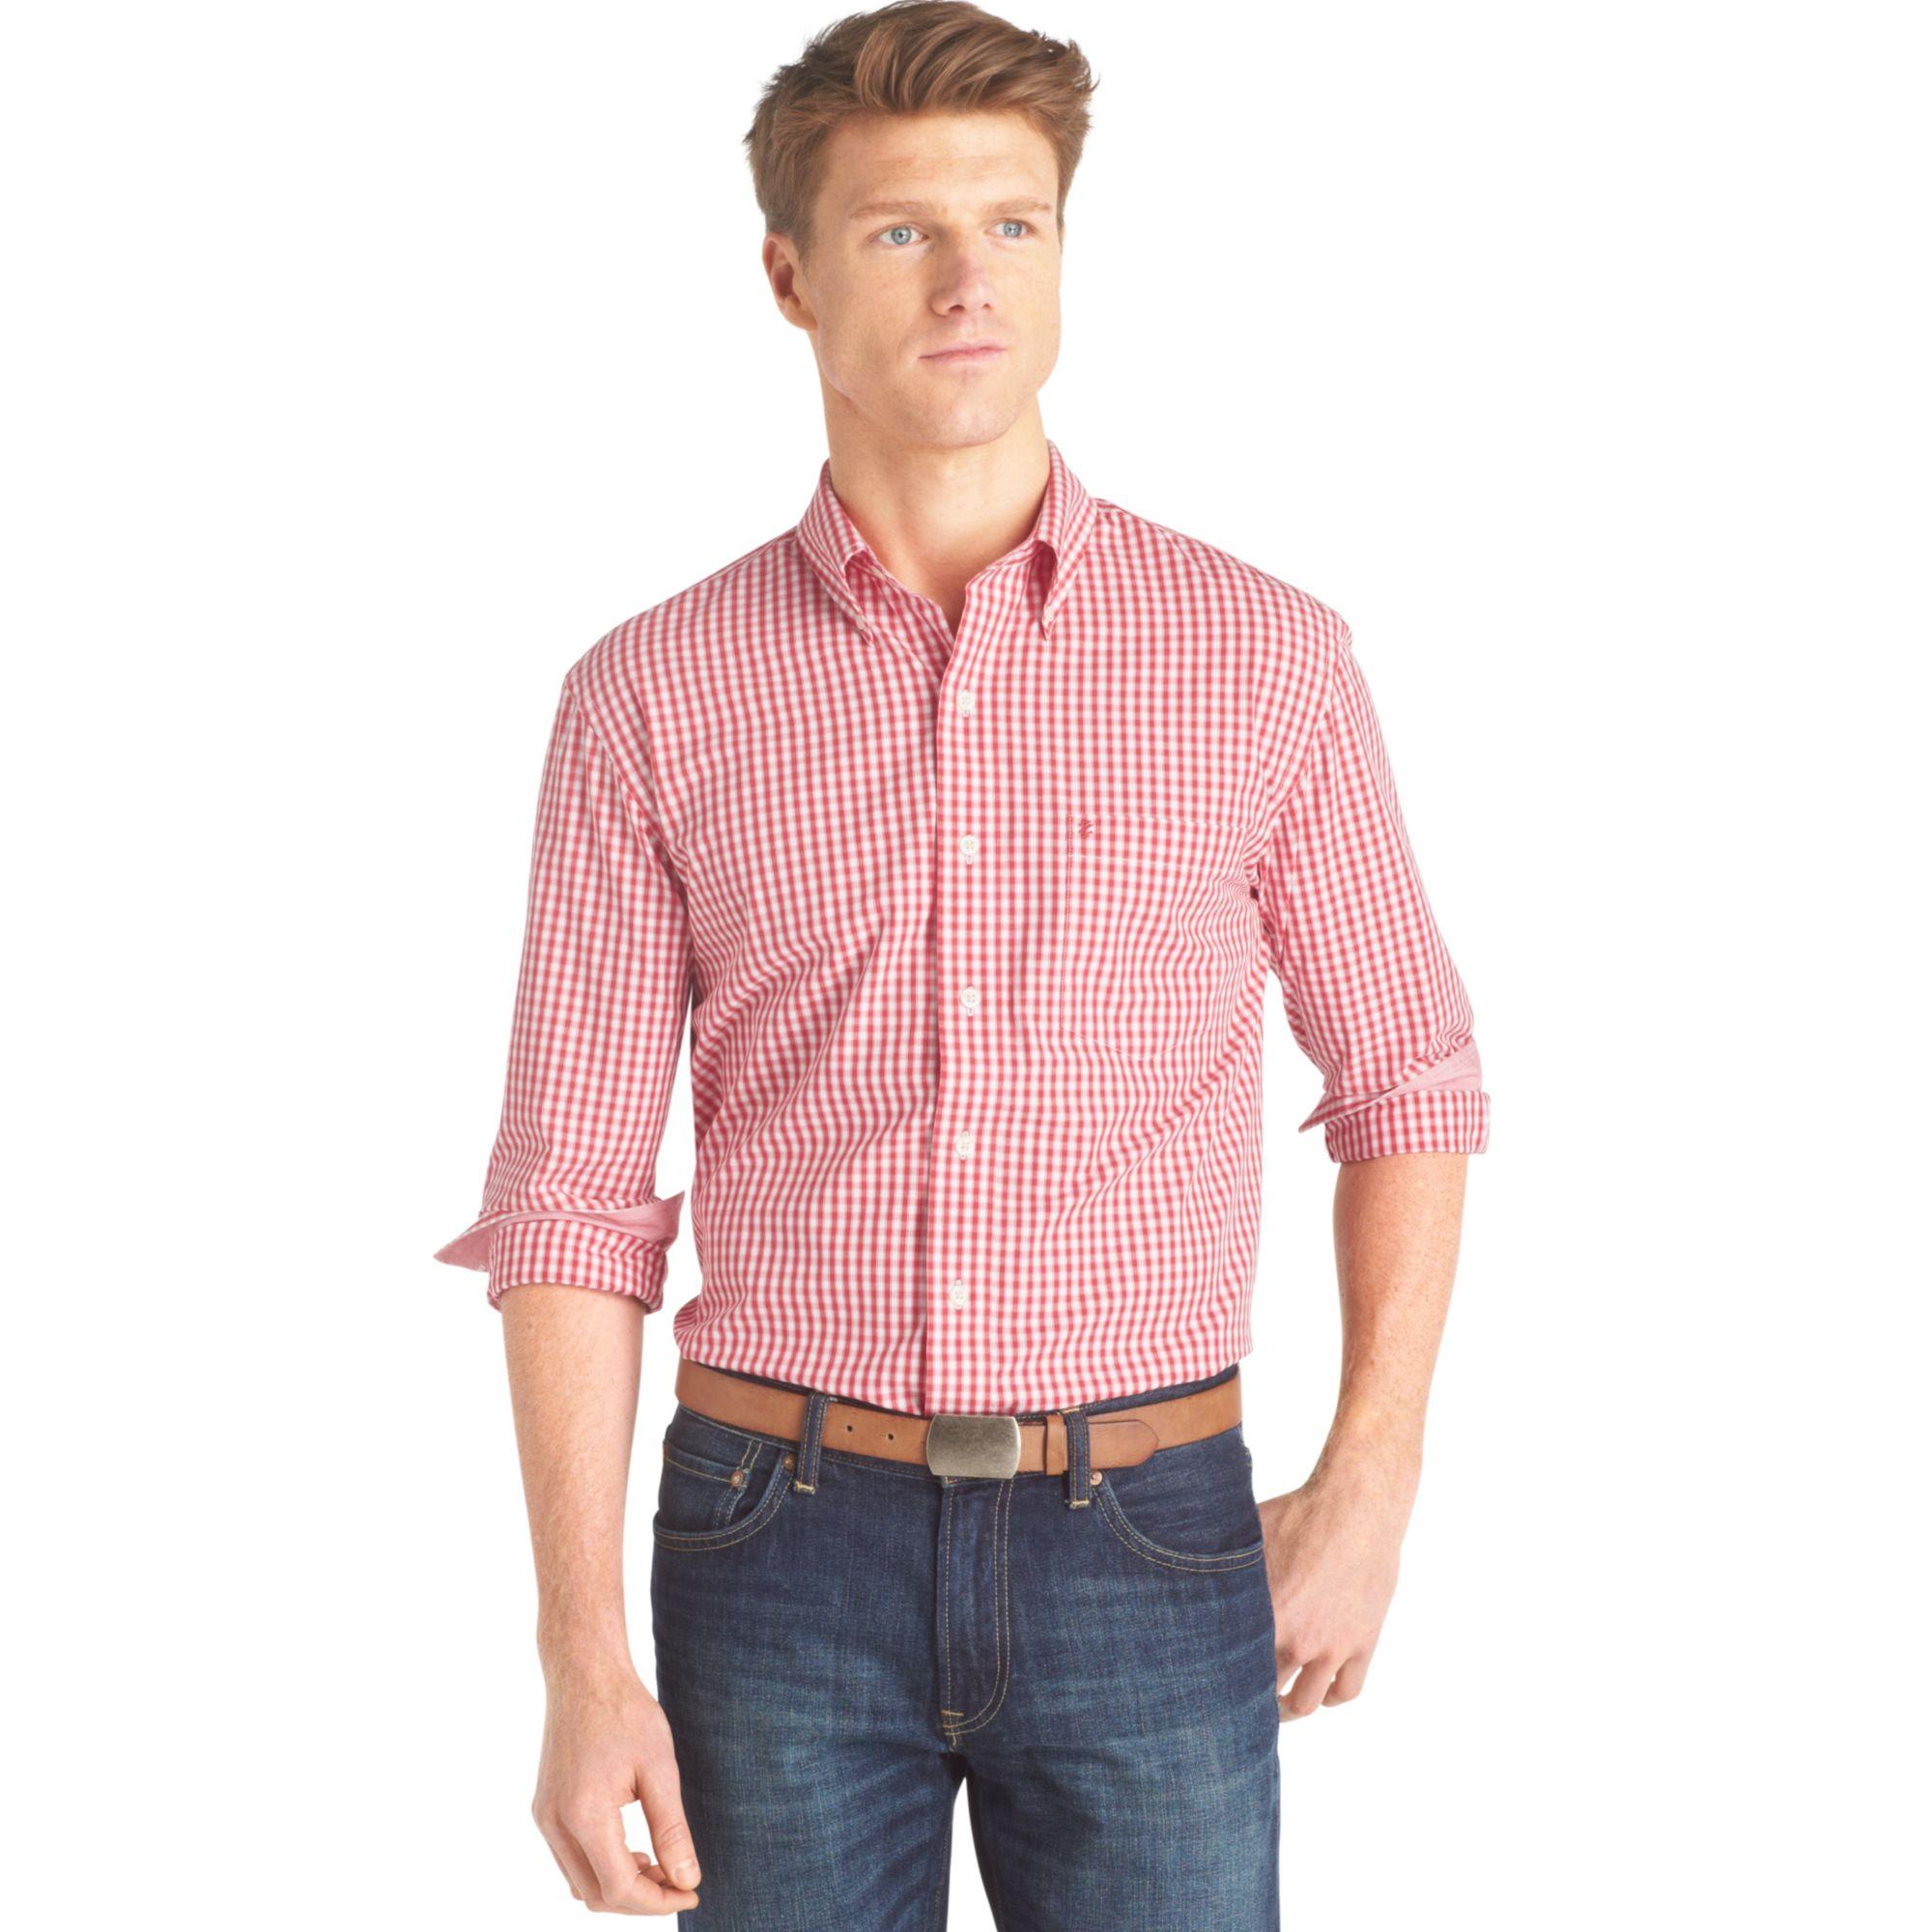 Izod big and tall essential shadow gingham shirt in red for Izod big and tall shirts